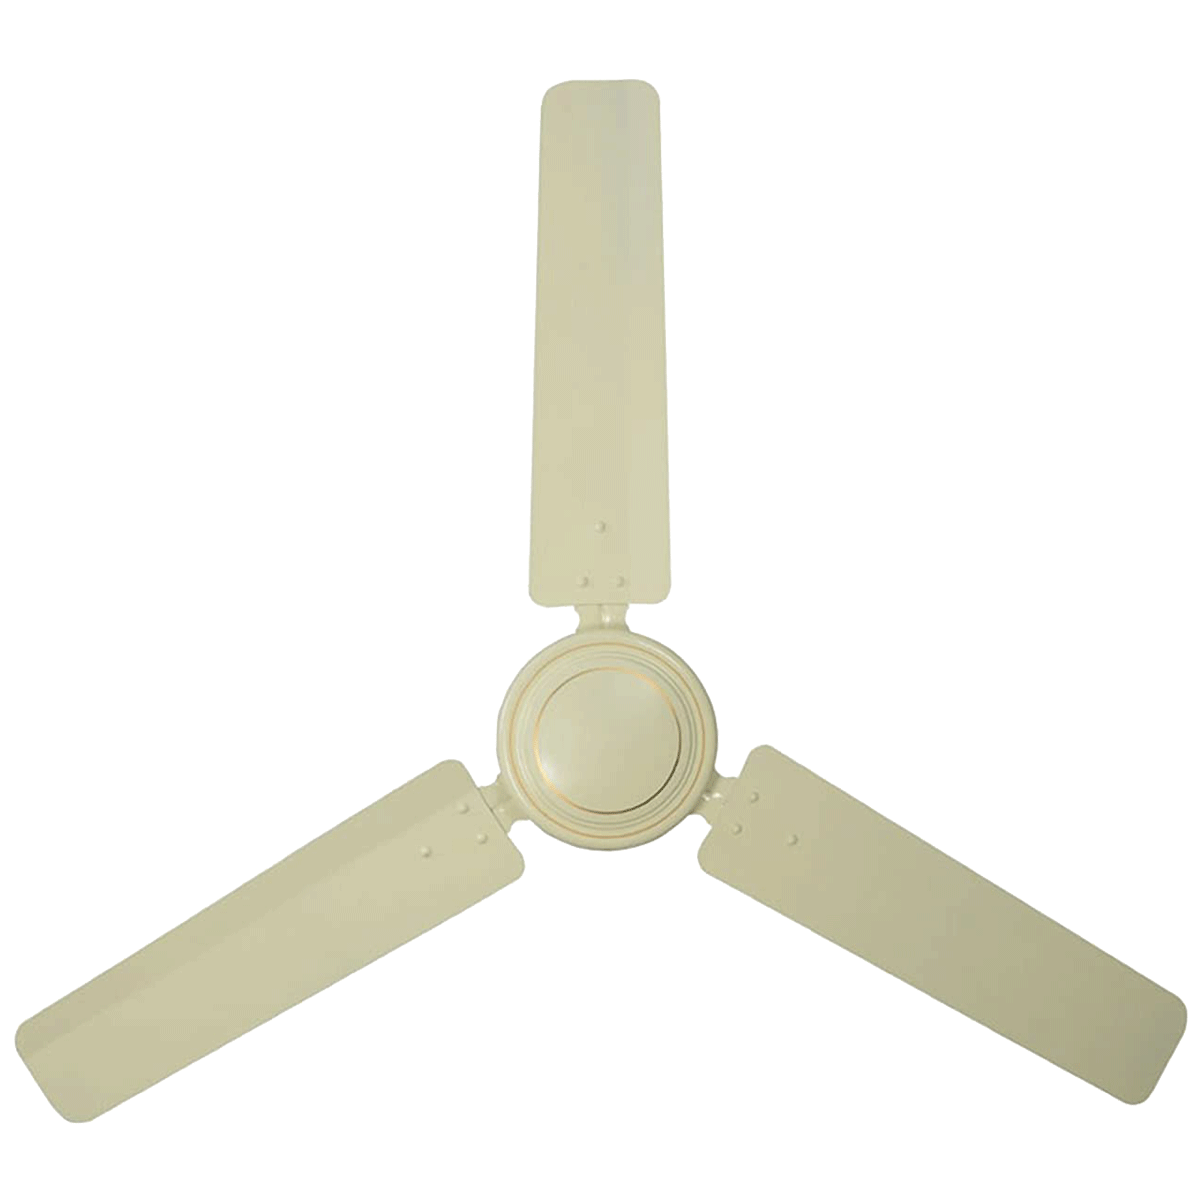 USHA Swift 120 cm Sweep 3 Blades Ceiling Fan (High lift angle blade, 111148831W, Ivory)_1